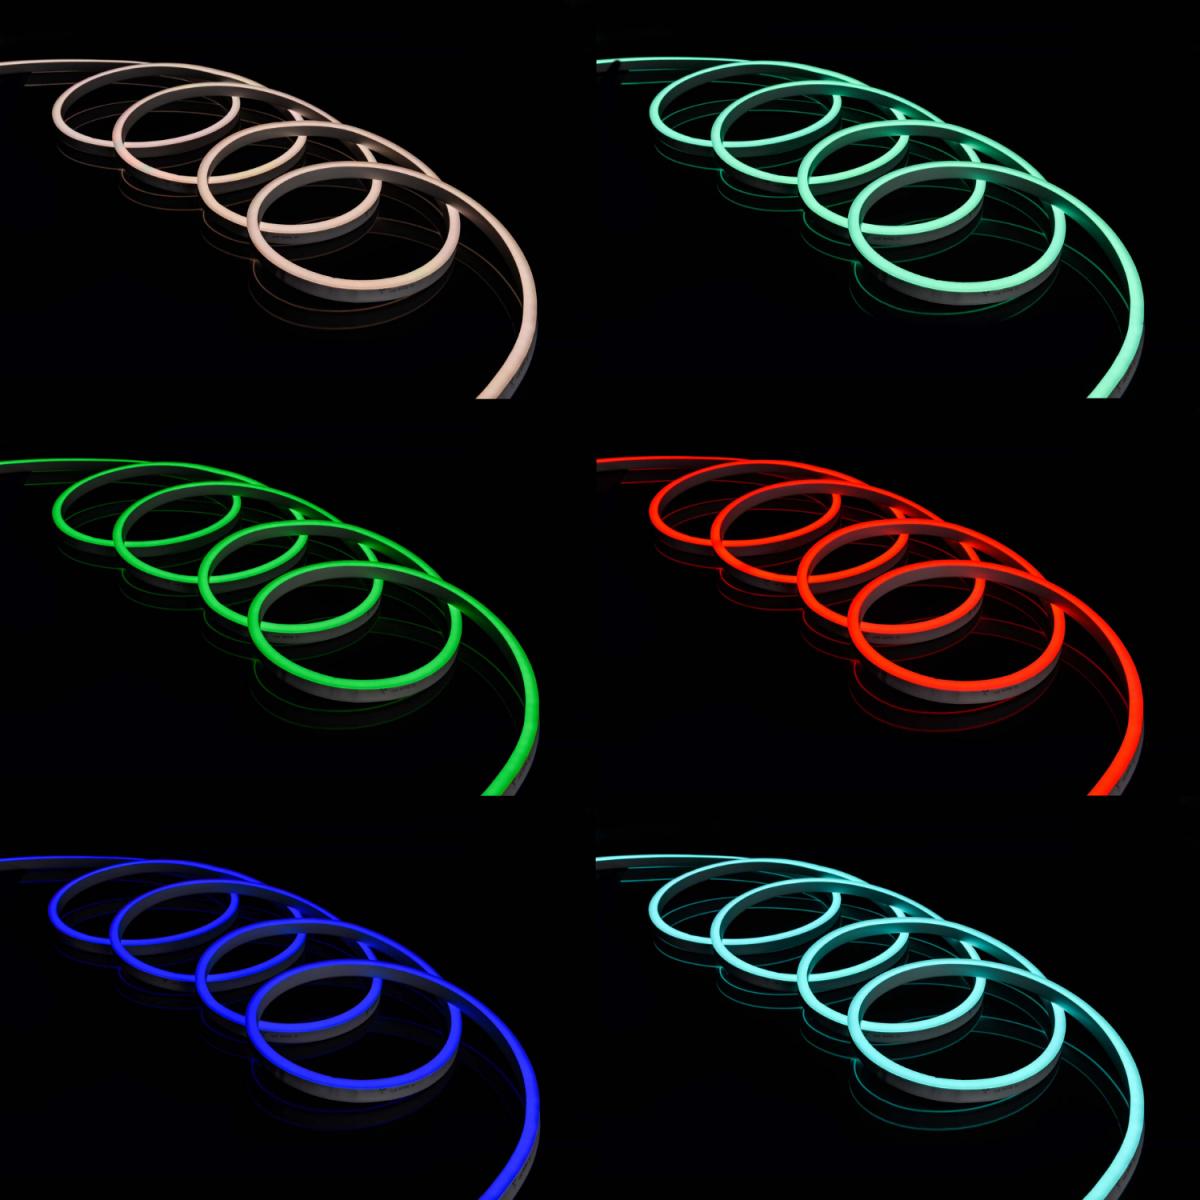 RGB Neon Flex 220V 18 x 21 - ukledlights.co.uk